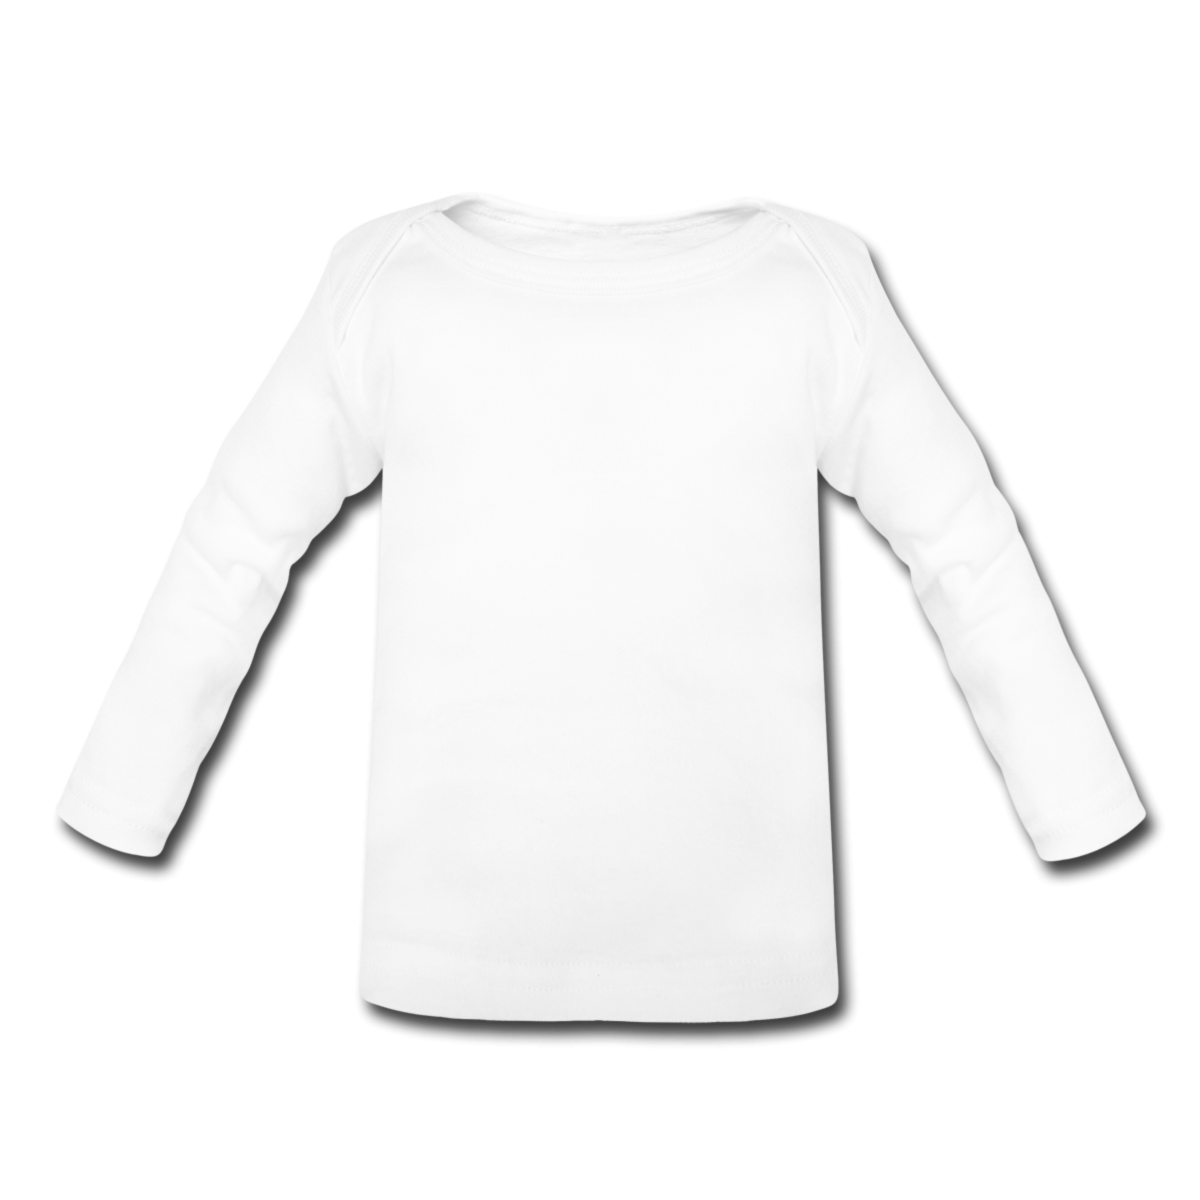 Blank Long Sleeve T-Shirt Template